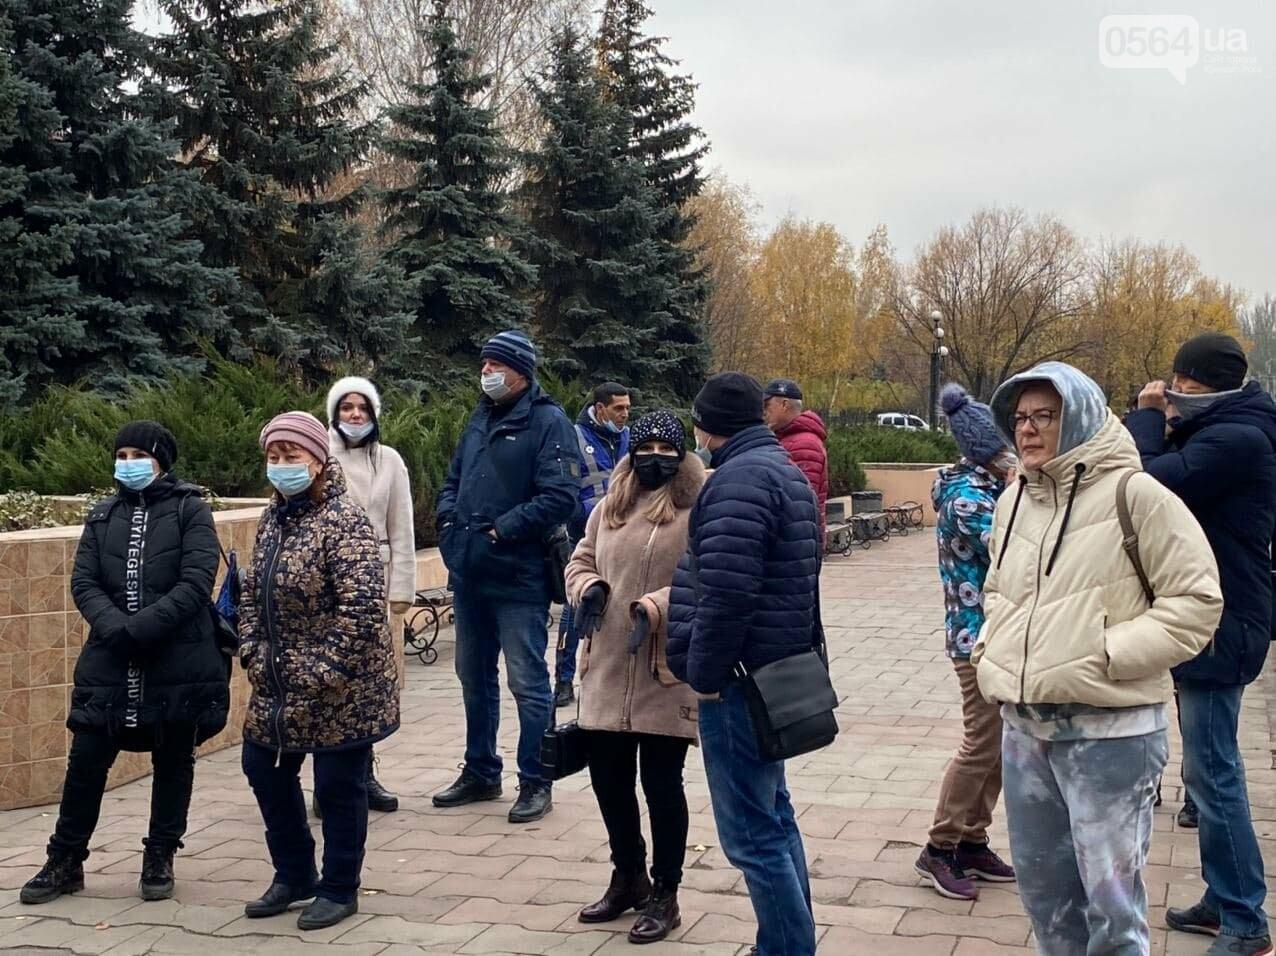 Представители малого бизнеса продолжили протест возле мэрии Кривого Рога, - ФОТО, ВИДЕО, фото-13